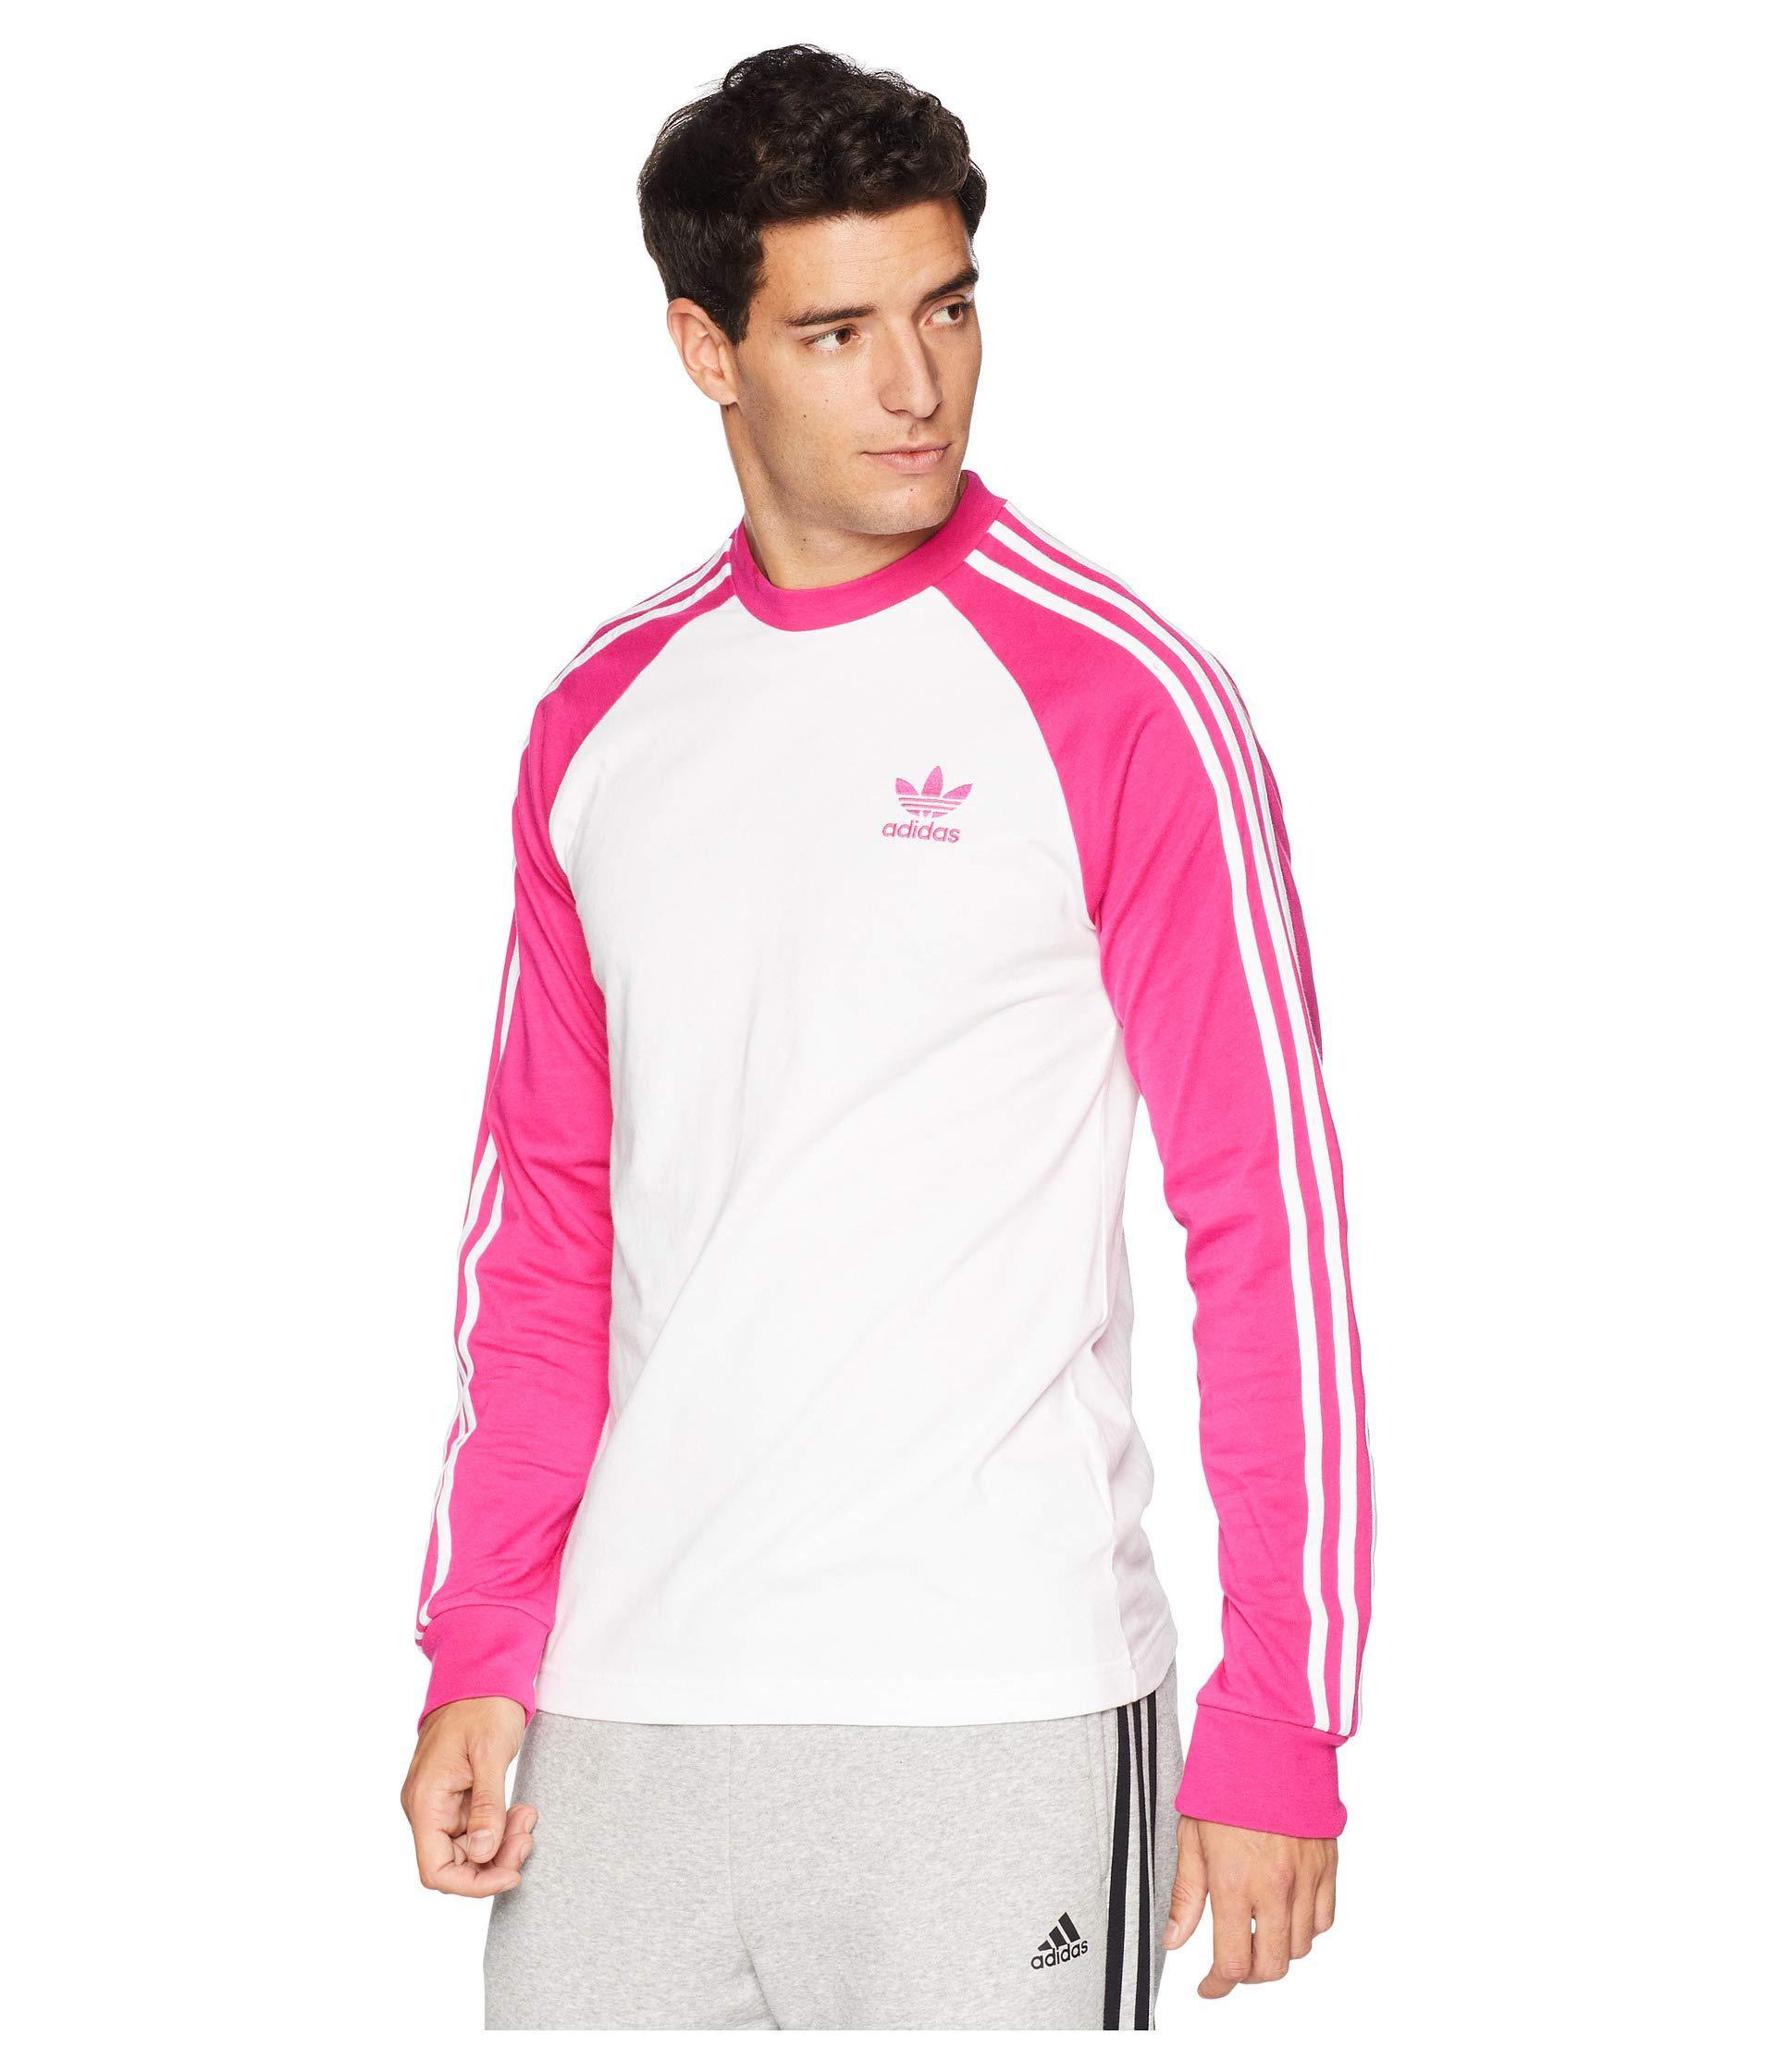 74d79bf1fd0 adidas Originals 3-stripes Long Sleeve Tee (shock Pink) Men's T ...